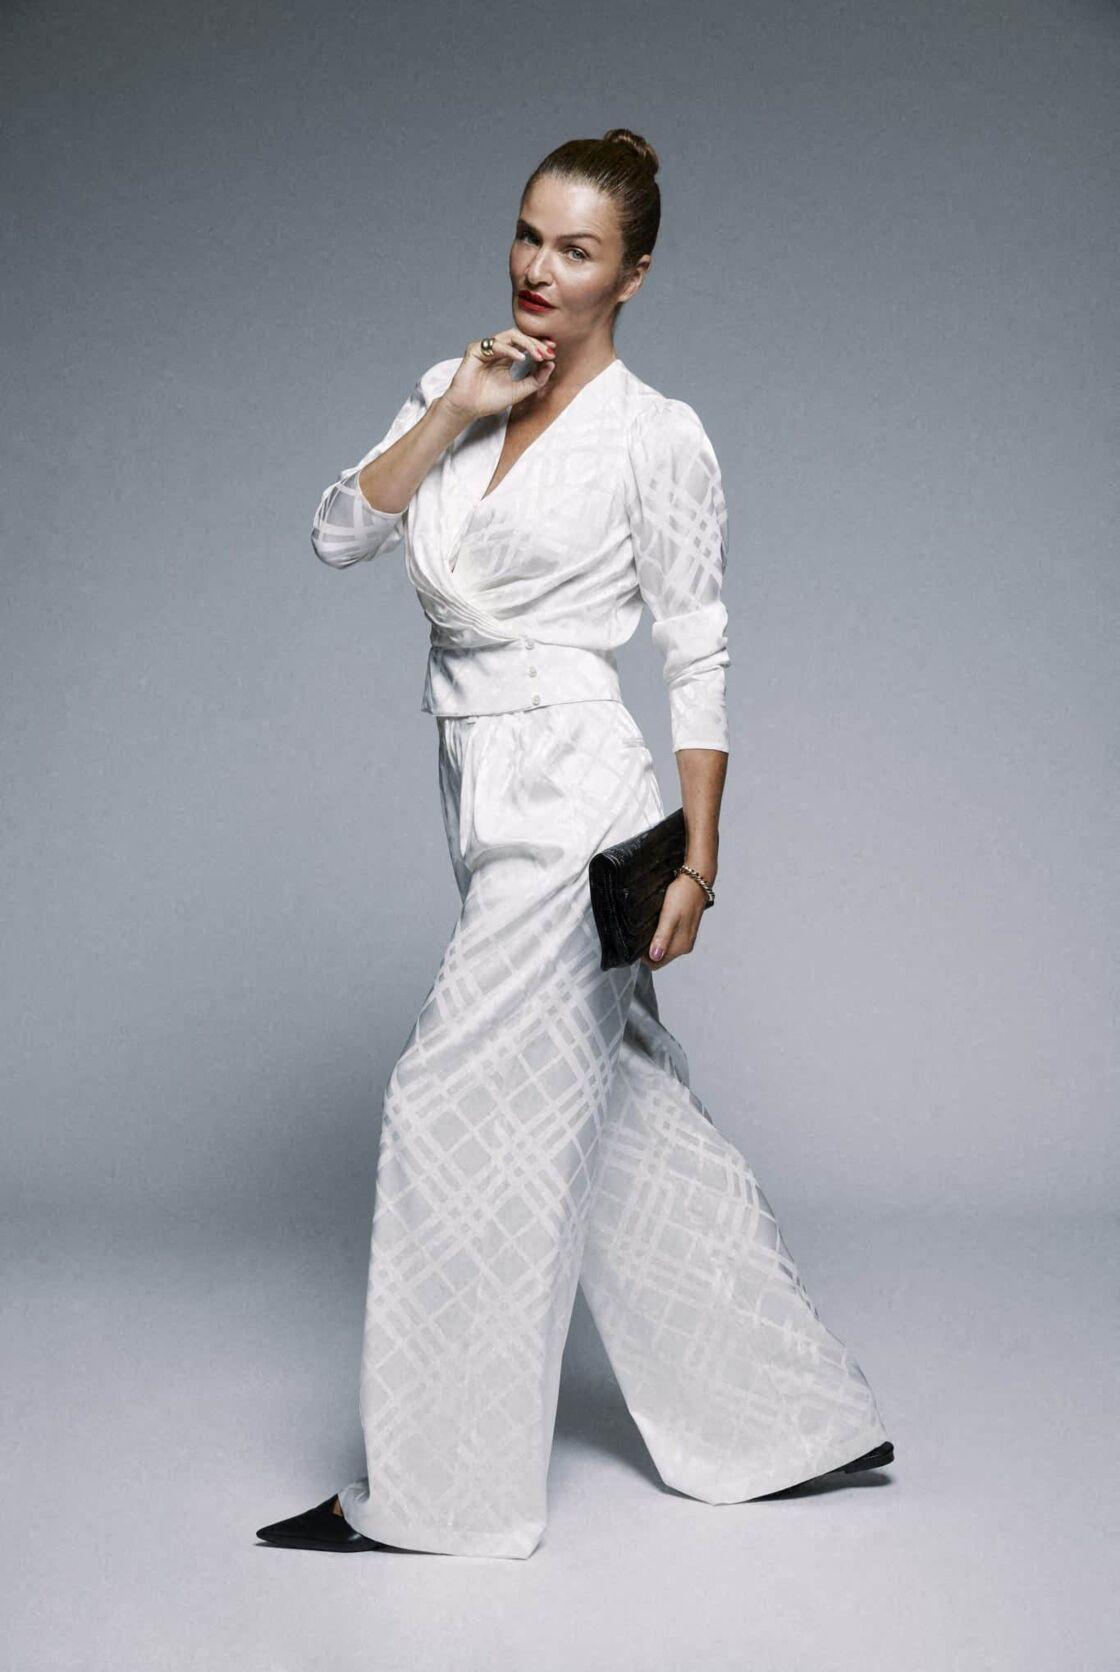 Helena Christensen, toujours aussi sculpturale, prend la pose pour Anine Bing